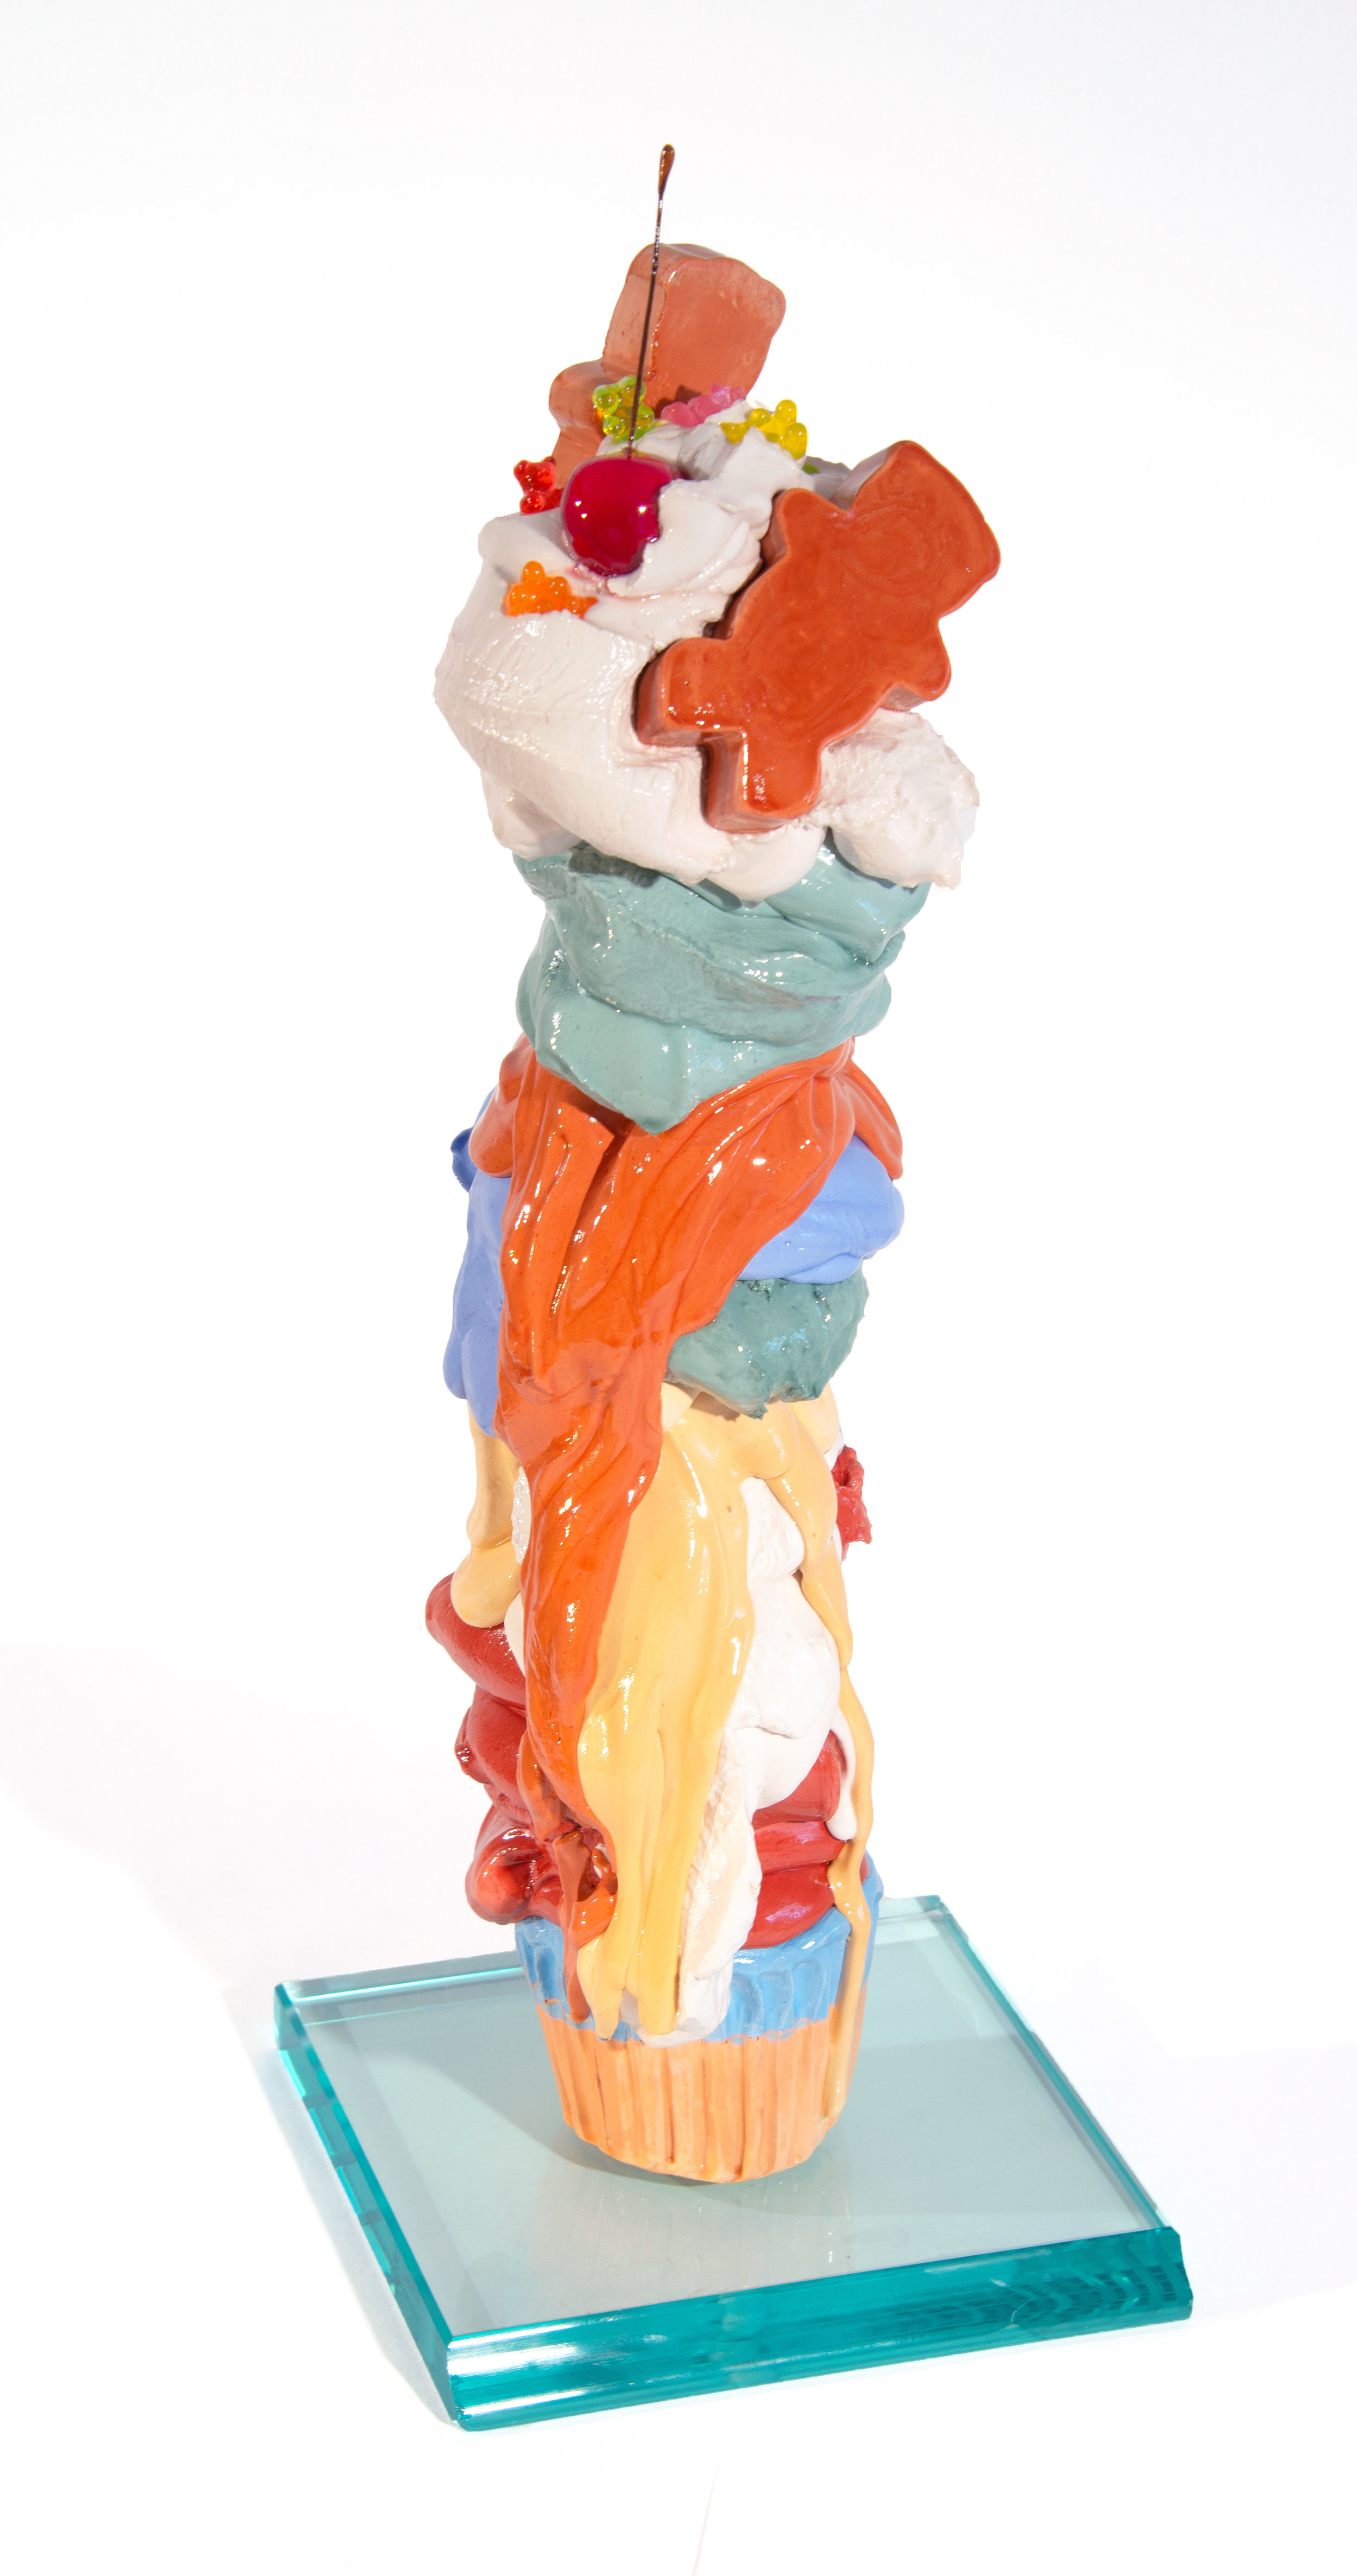 "Candyland - Olivia Bonilla19"" x 7"" x 7""Cement, glass, resin$1100"